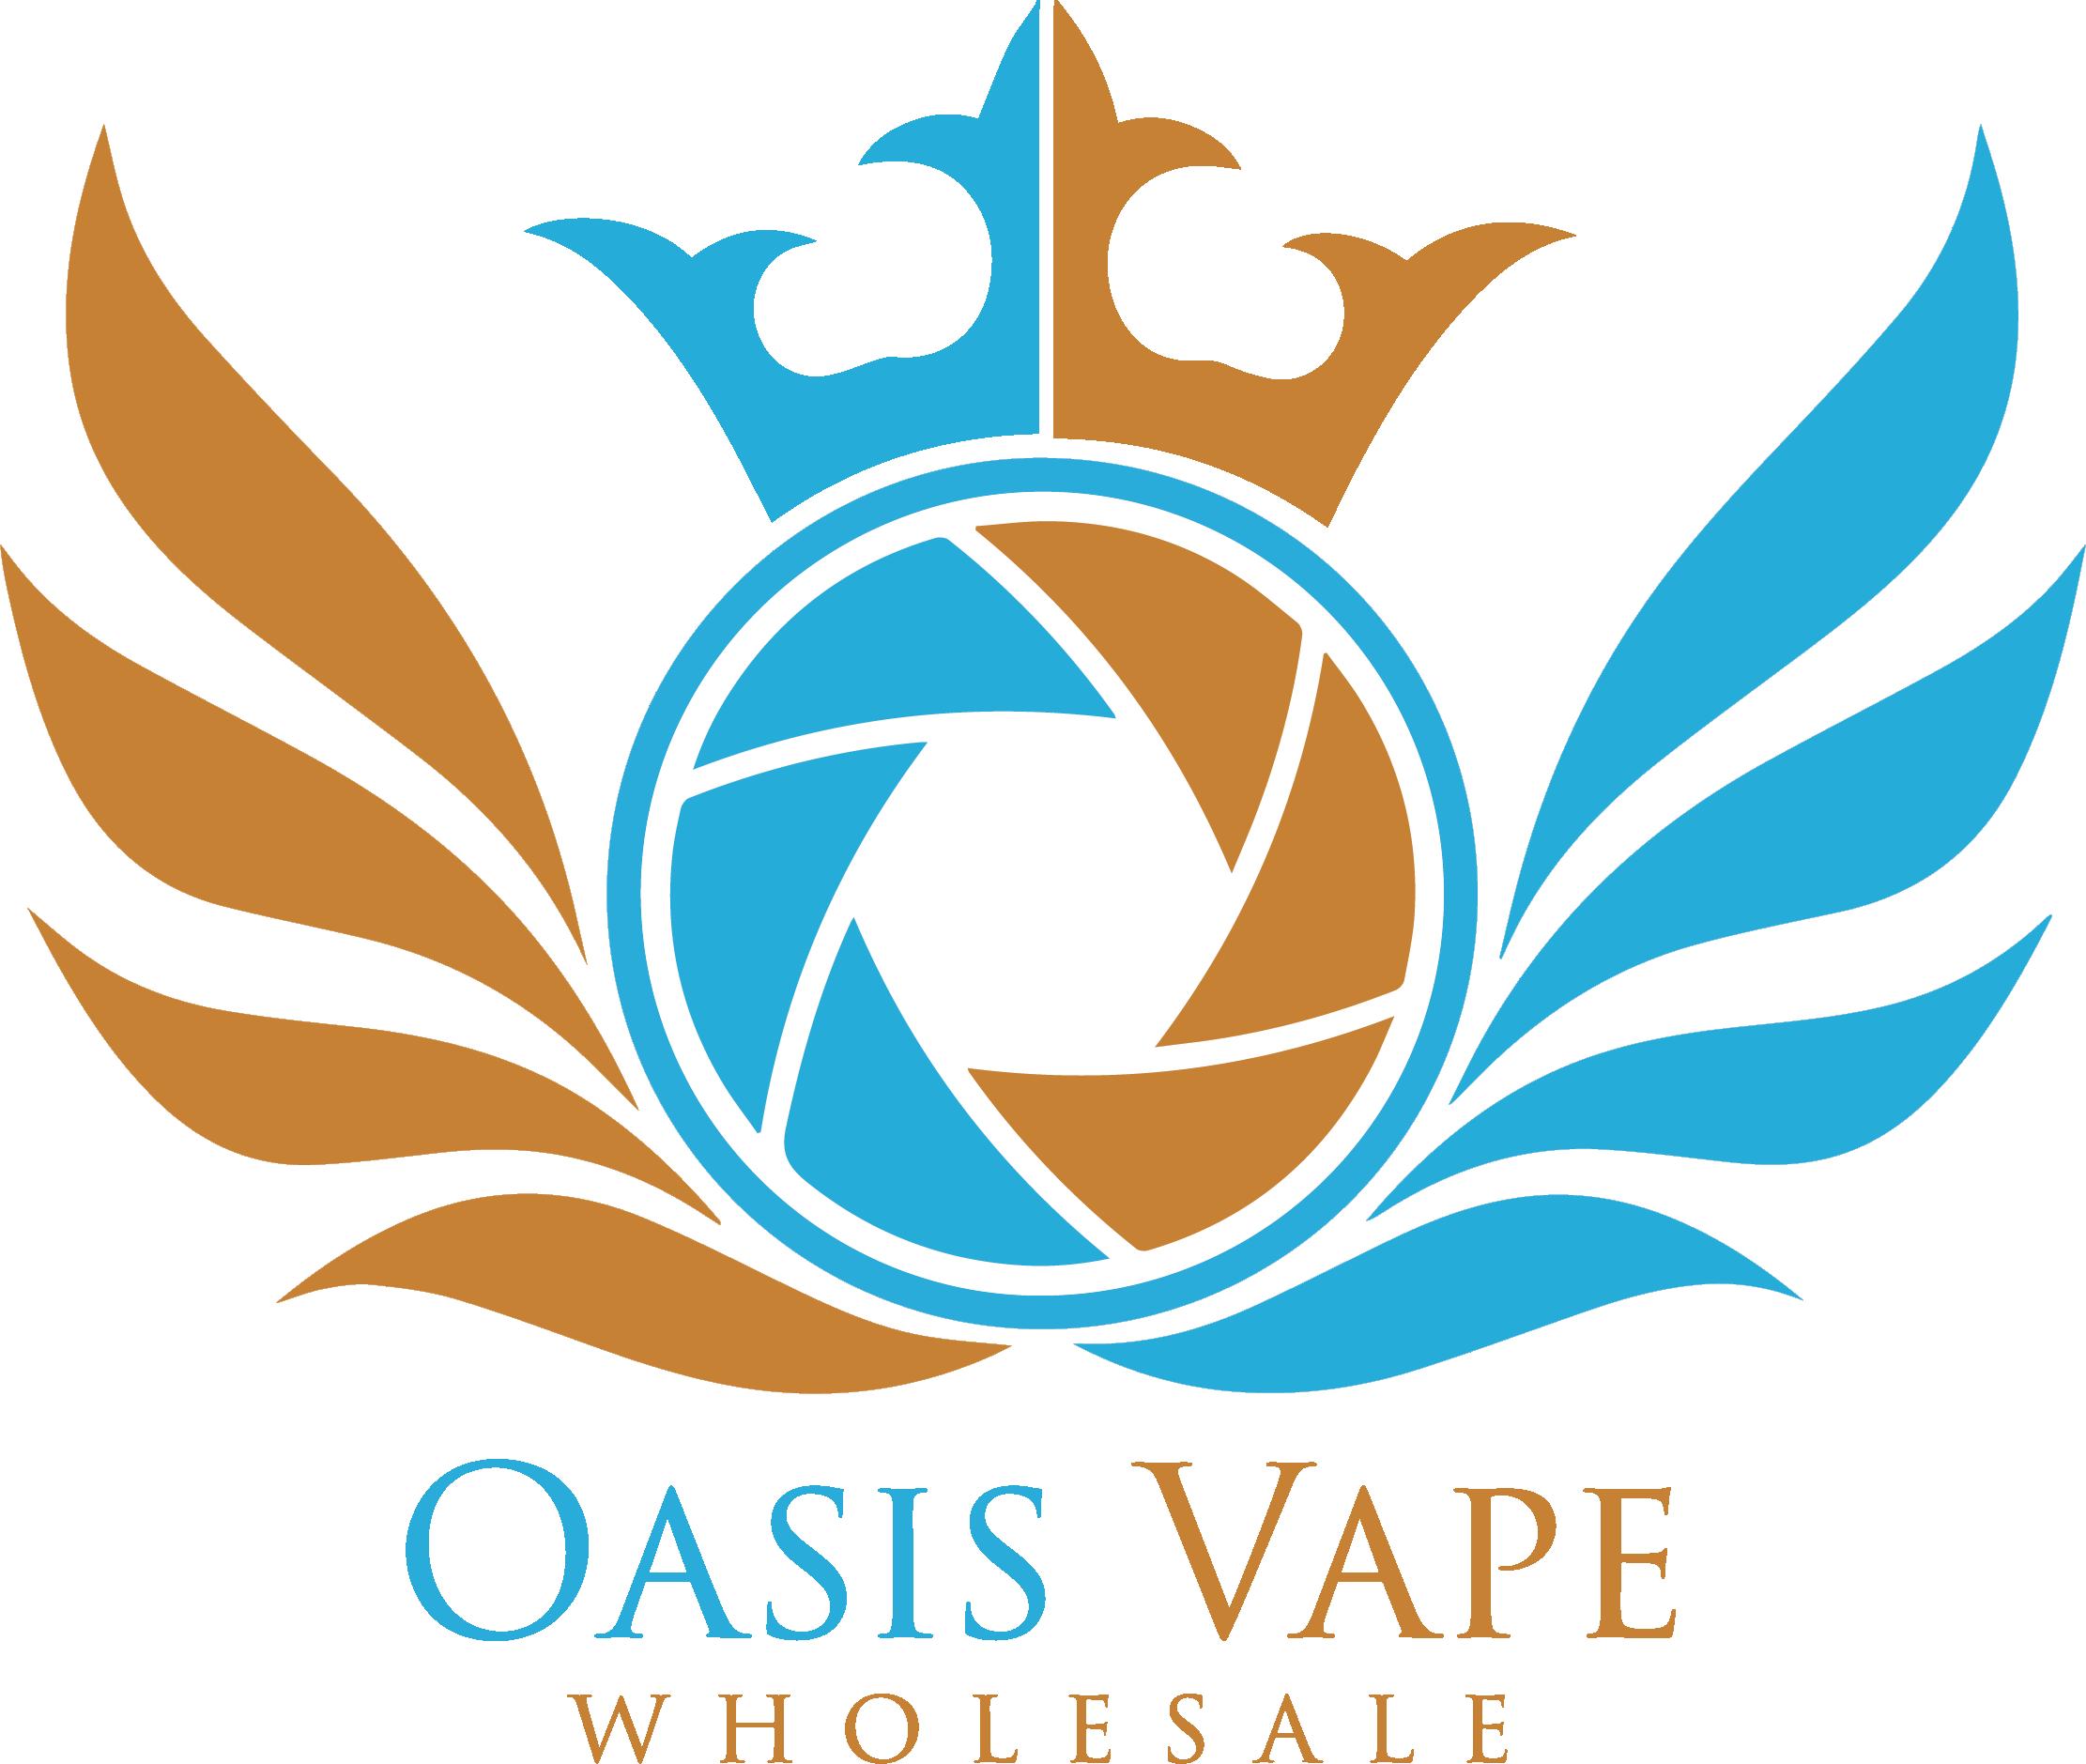 oasis-logo-wholesale-final.png